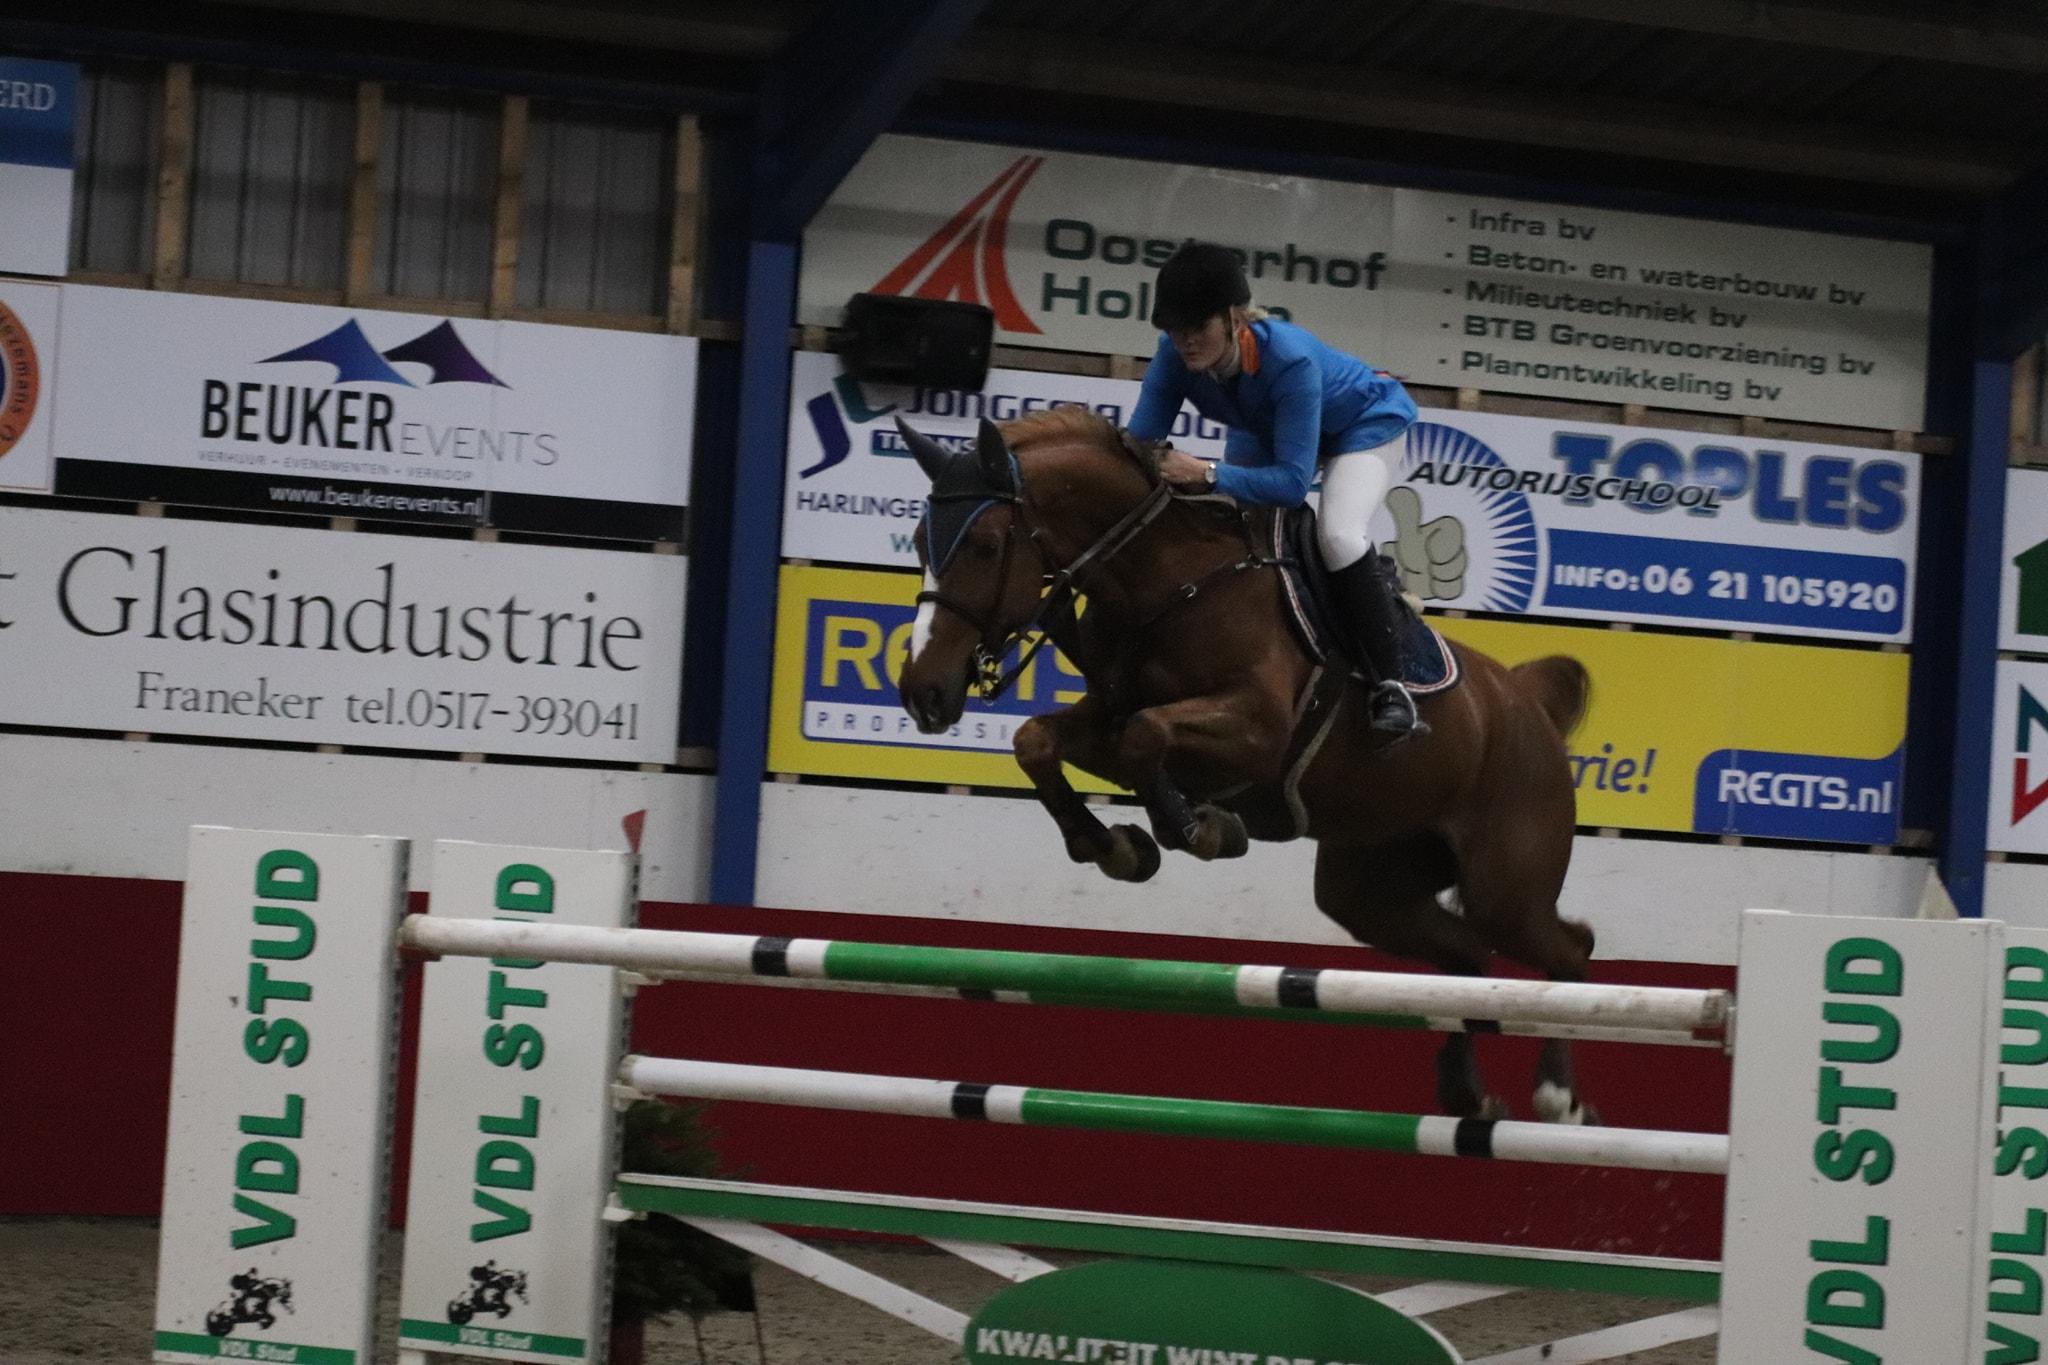 Marriët Smit Hoekstra wint GP Jumping Indoor Franeker